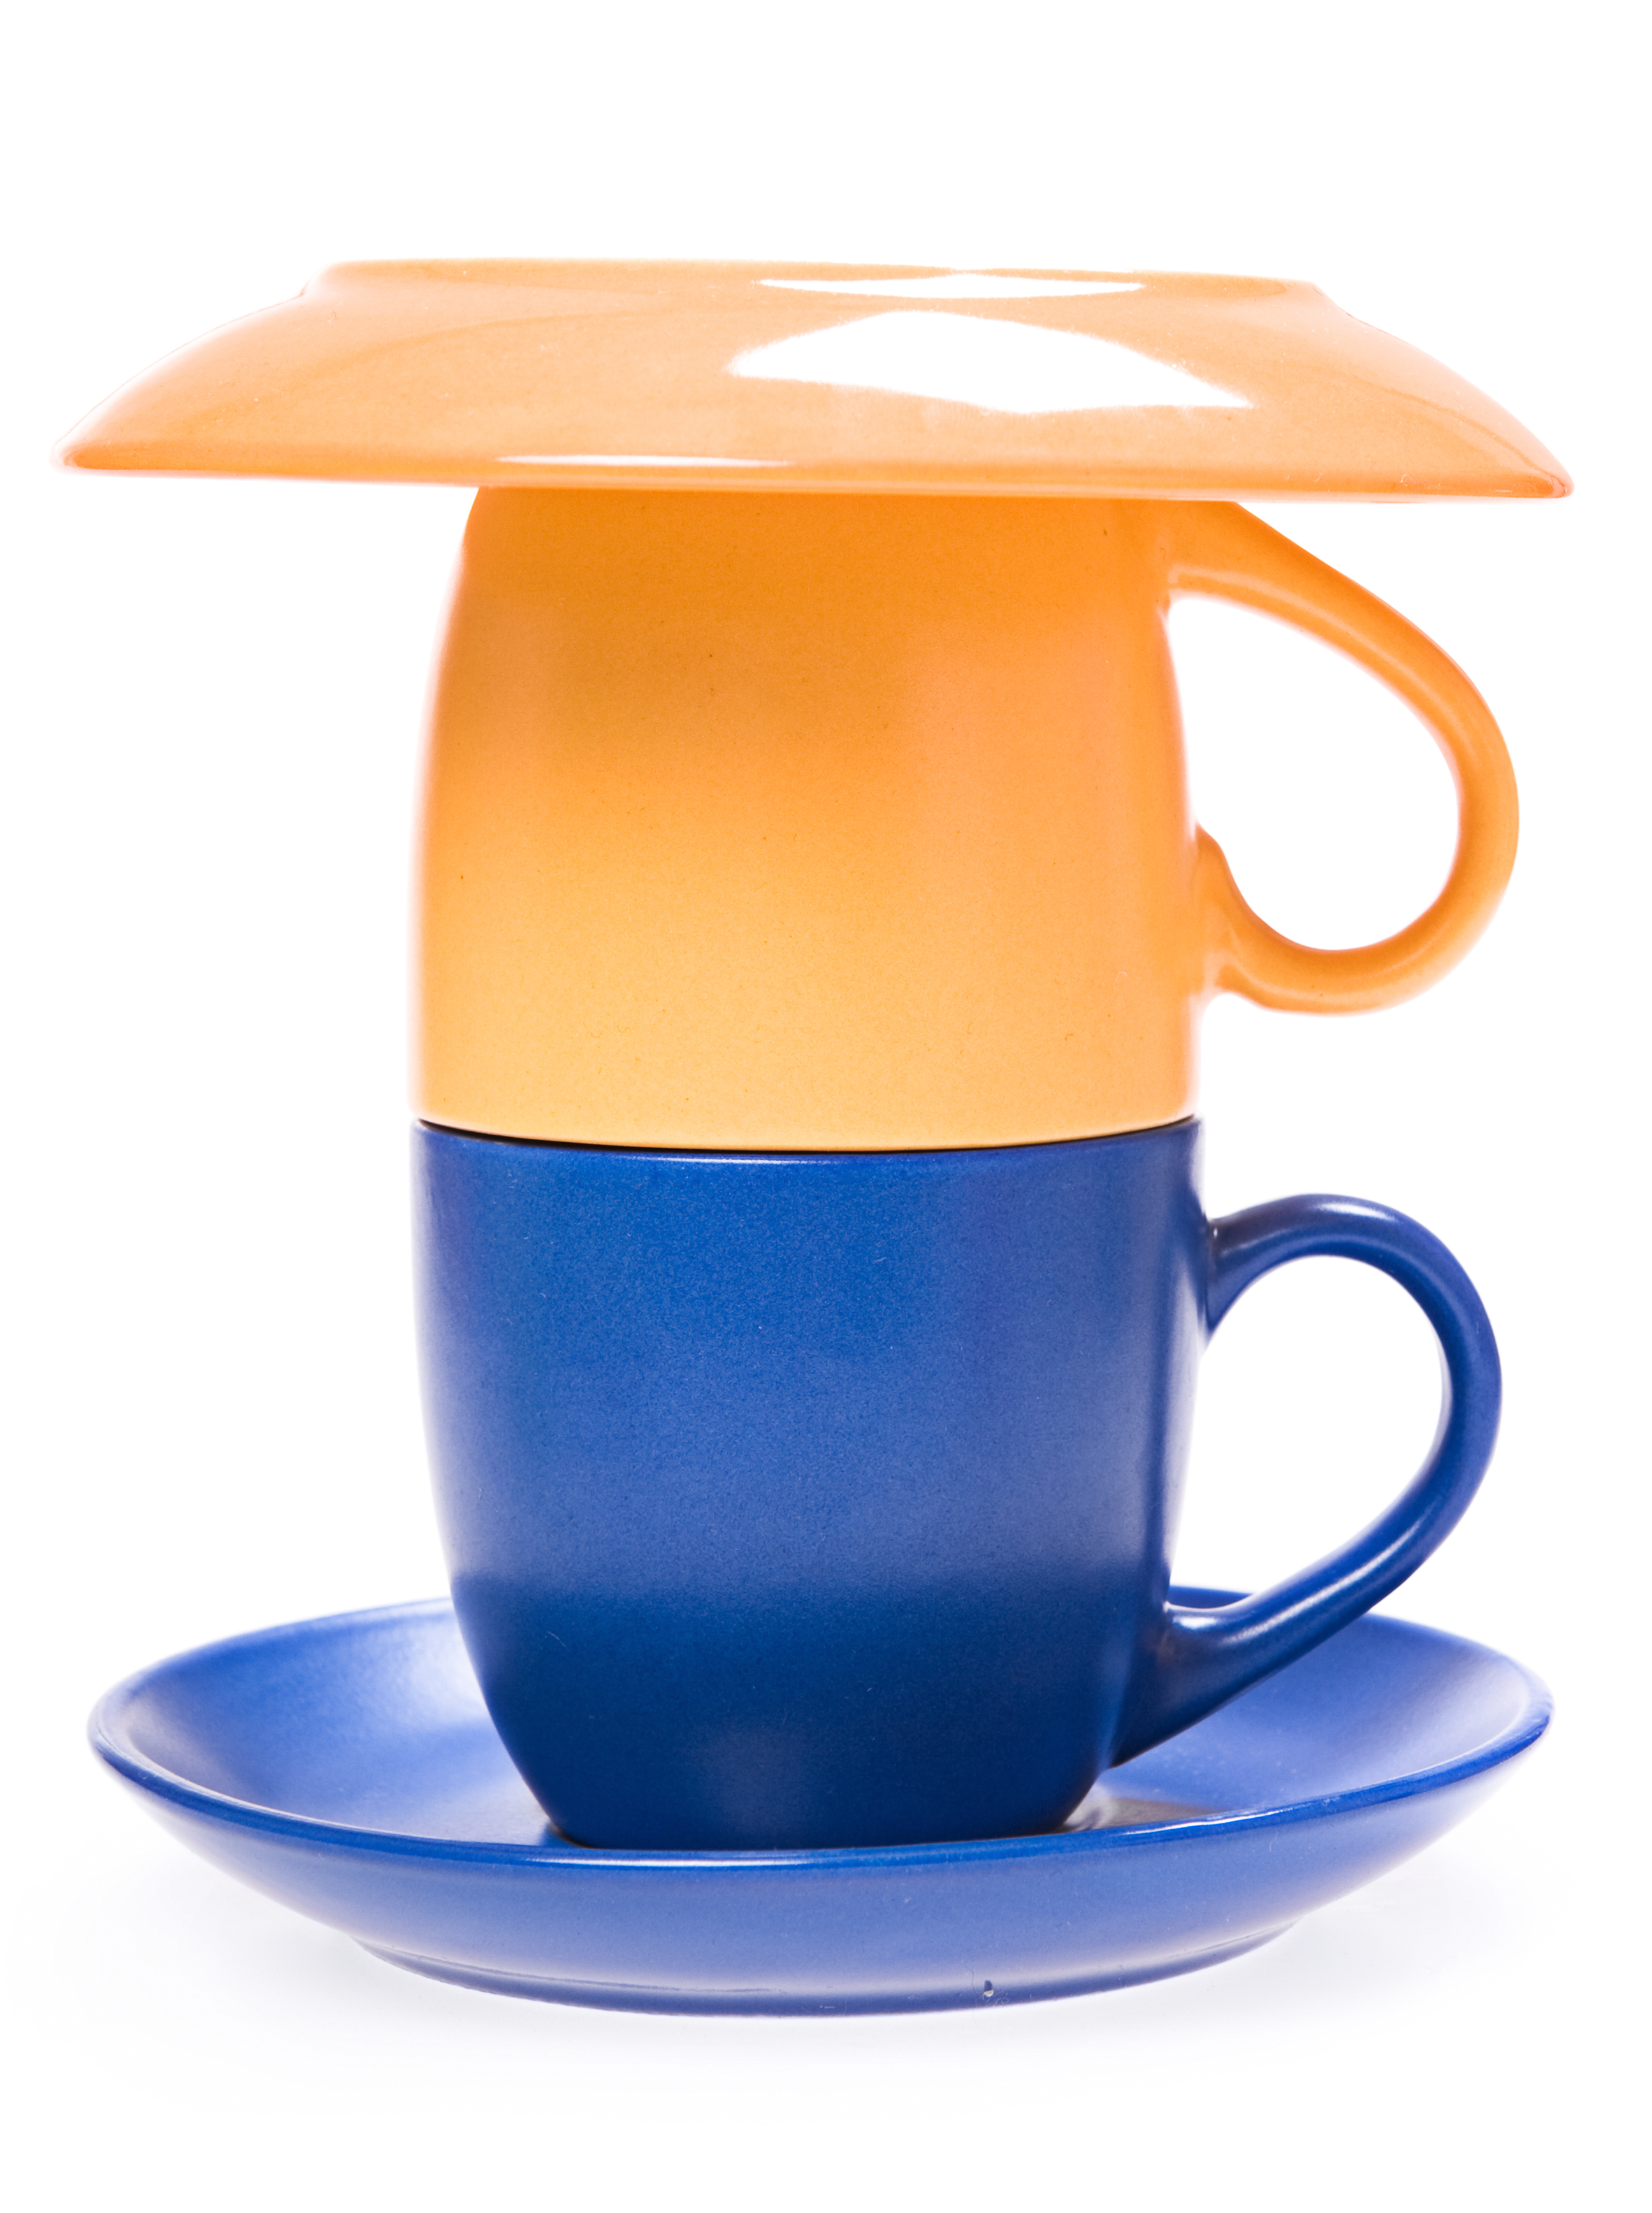 cups, Beverage, Plate, Many, Mug, HQ Photo